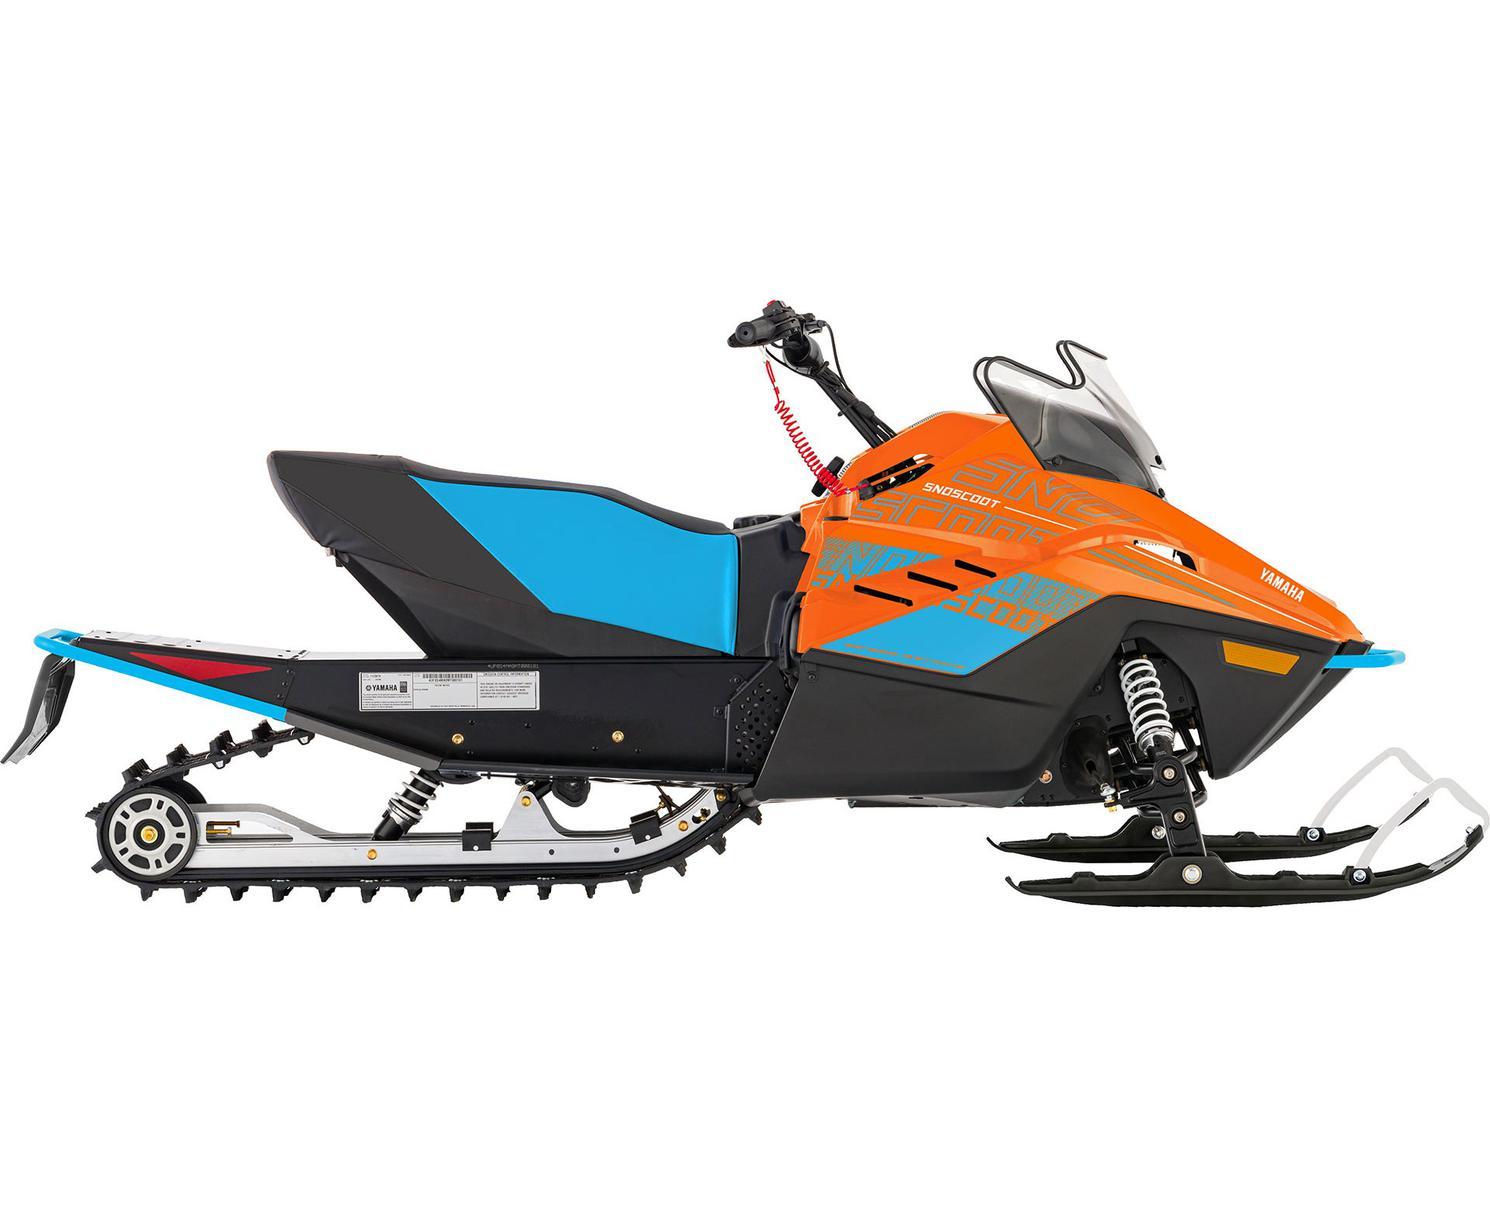 Yamaha Snoscoot ES Orange Vif/Bleu Jet Stream 2022